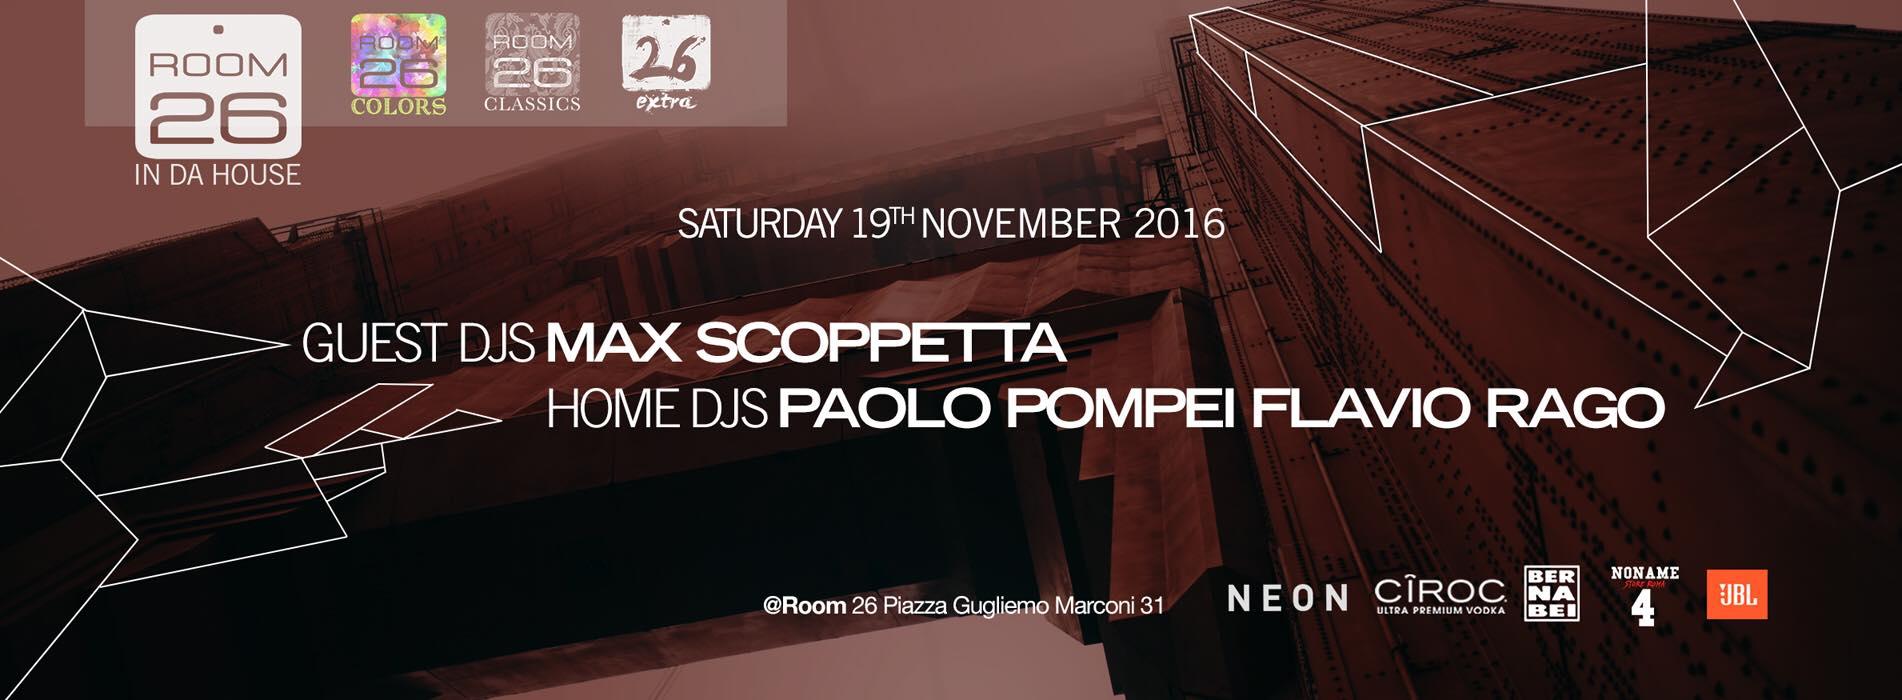 Discoteca Eur Room 26 sabato 19 novembre 2016